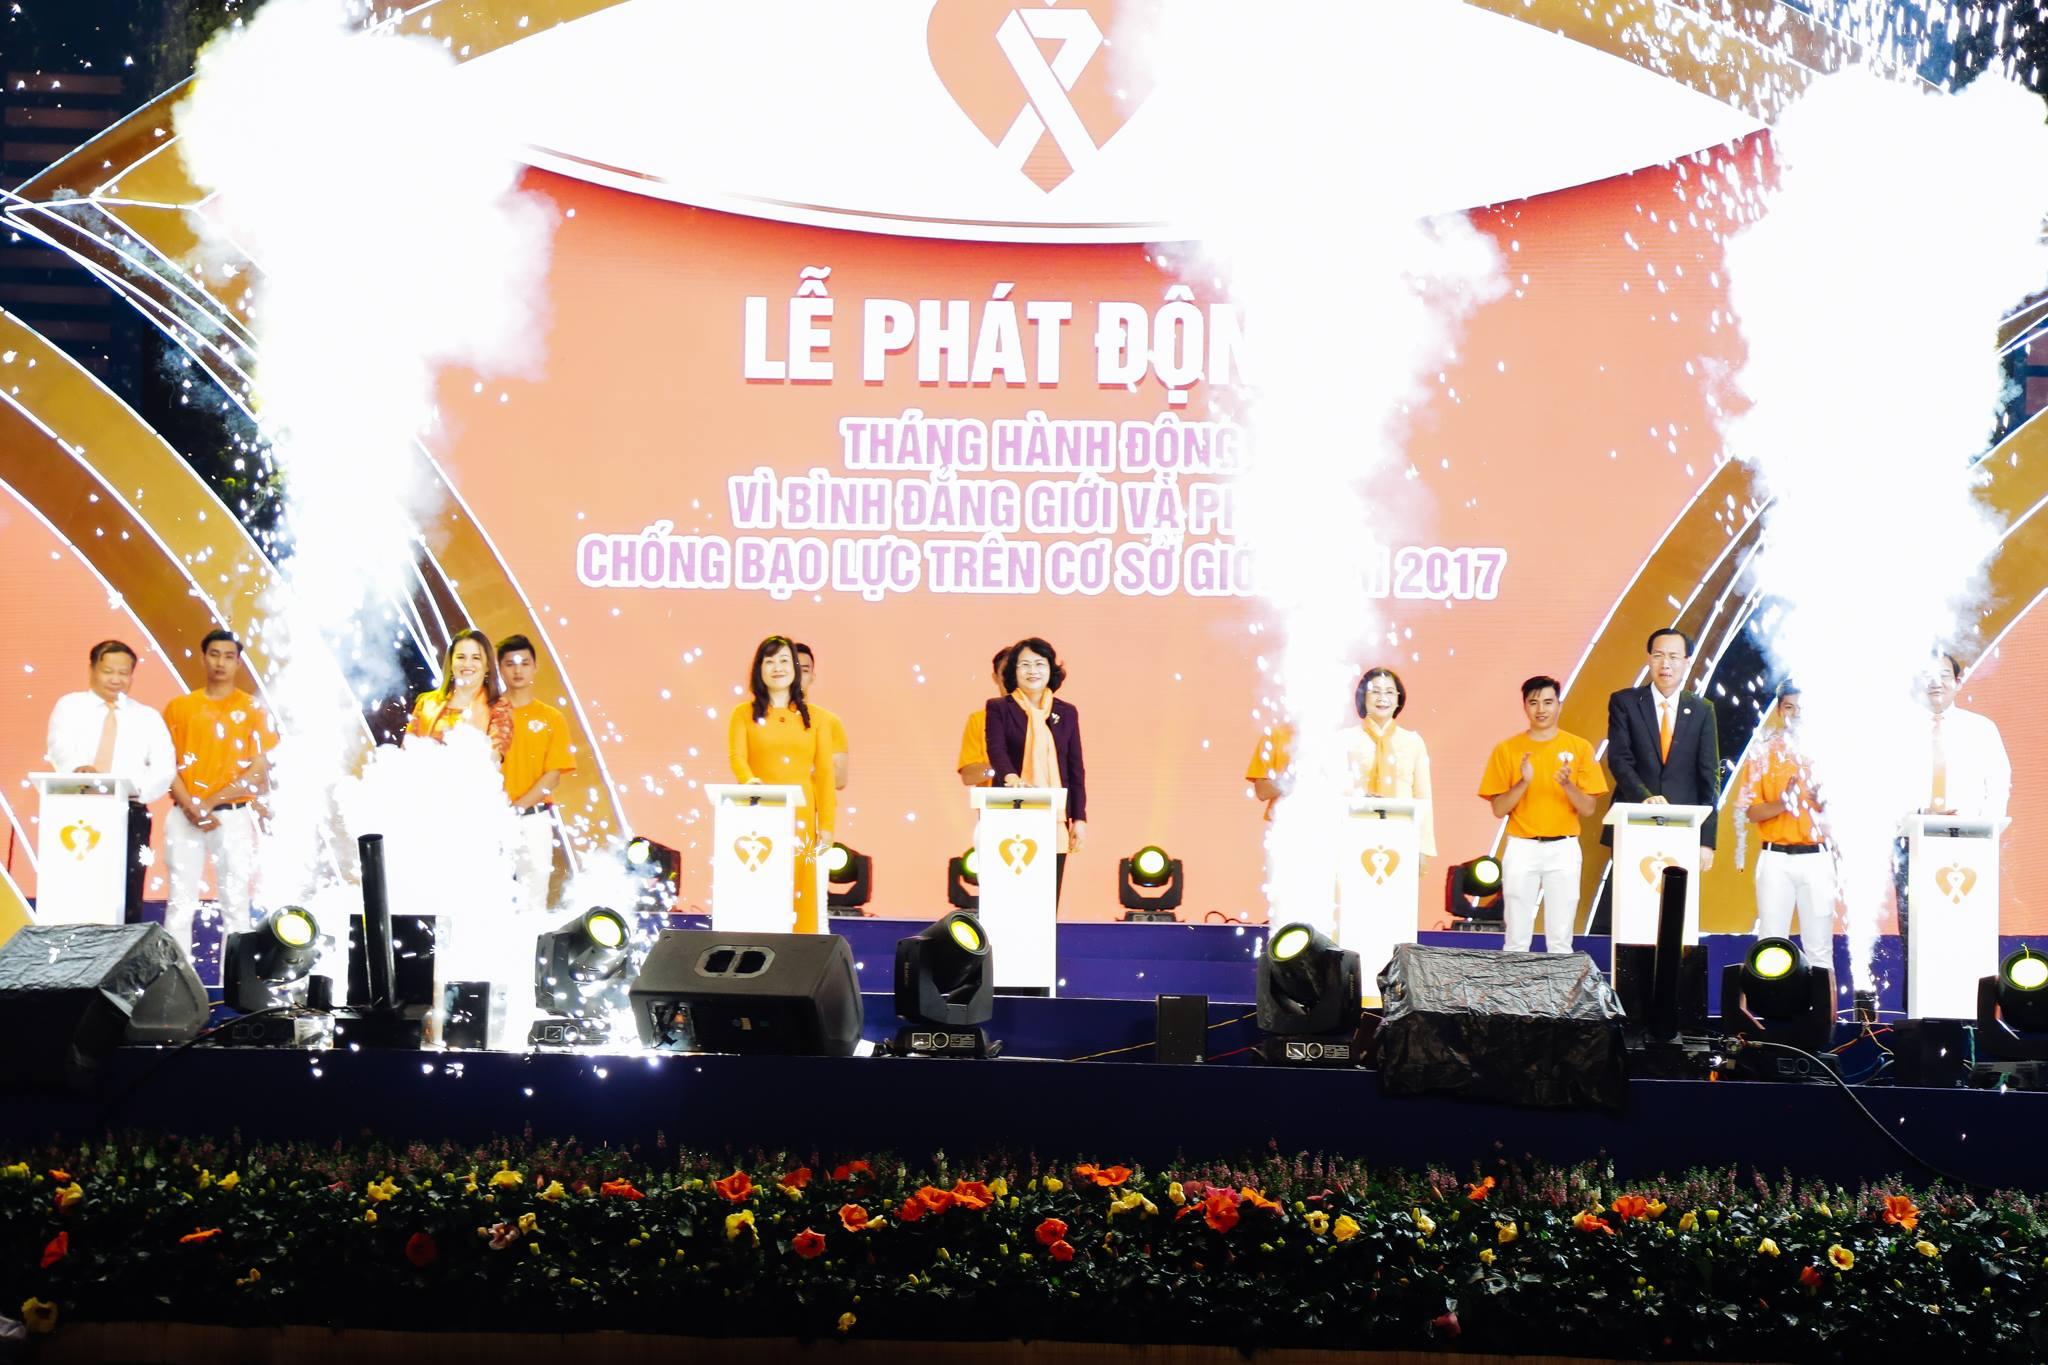 haylentieng2 - Sắc cam áo thun sự kiện UN Women Việt Nam